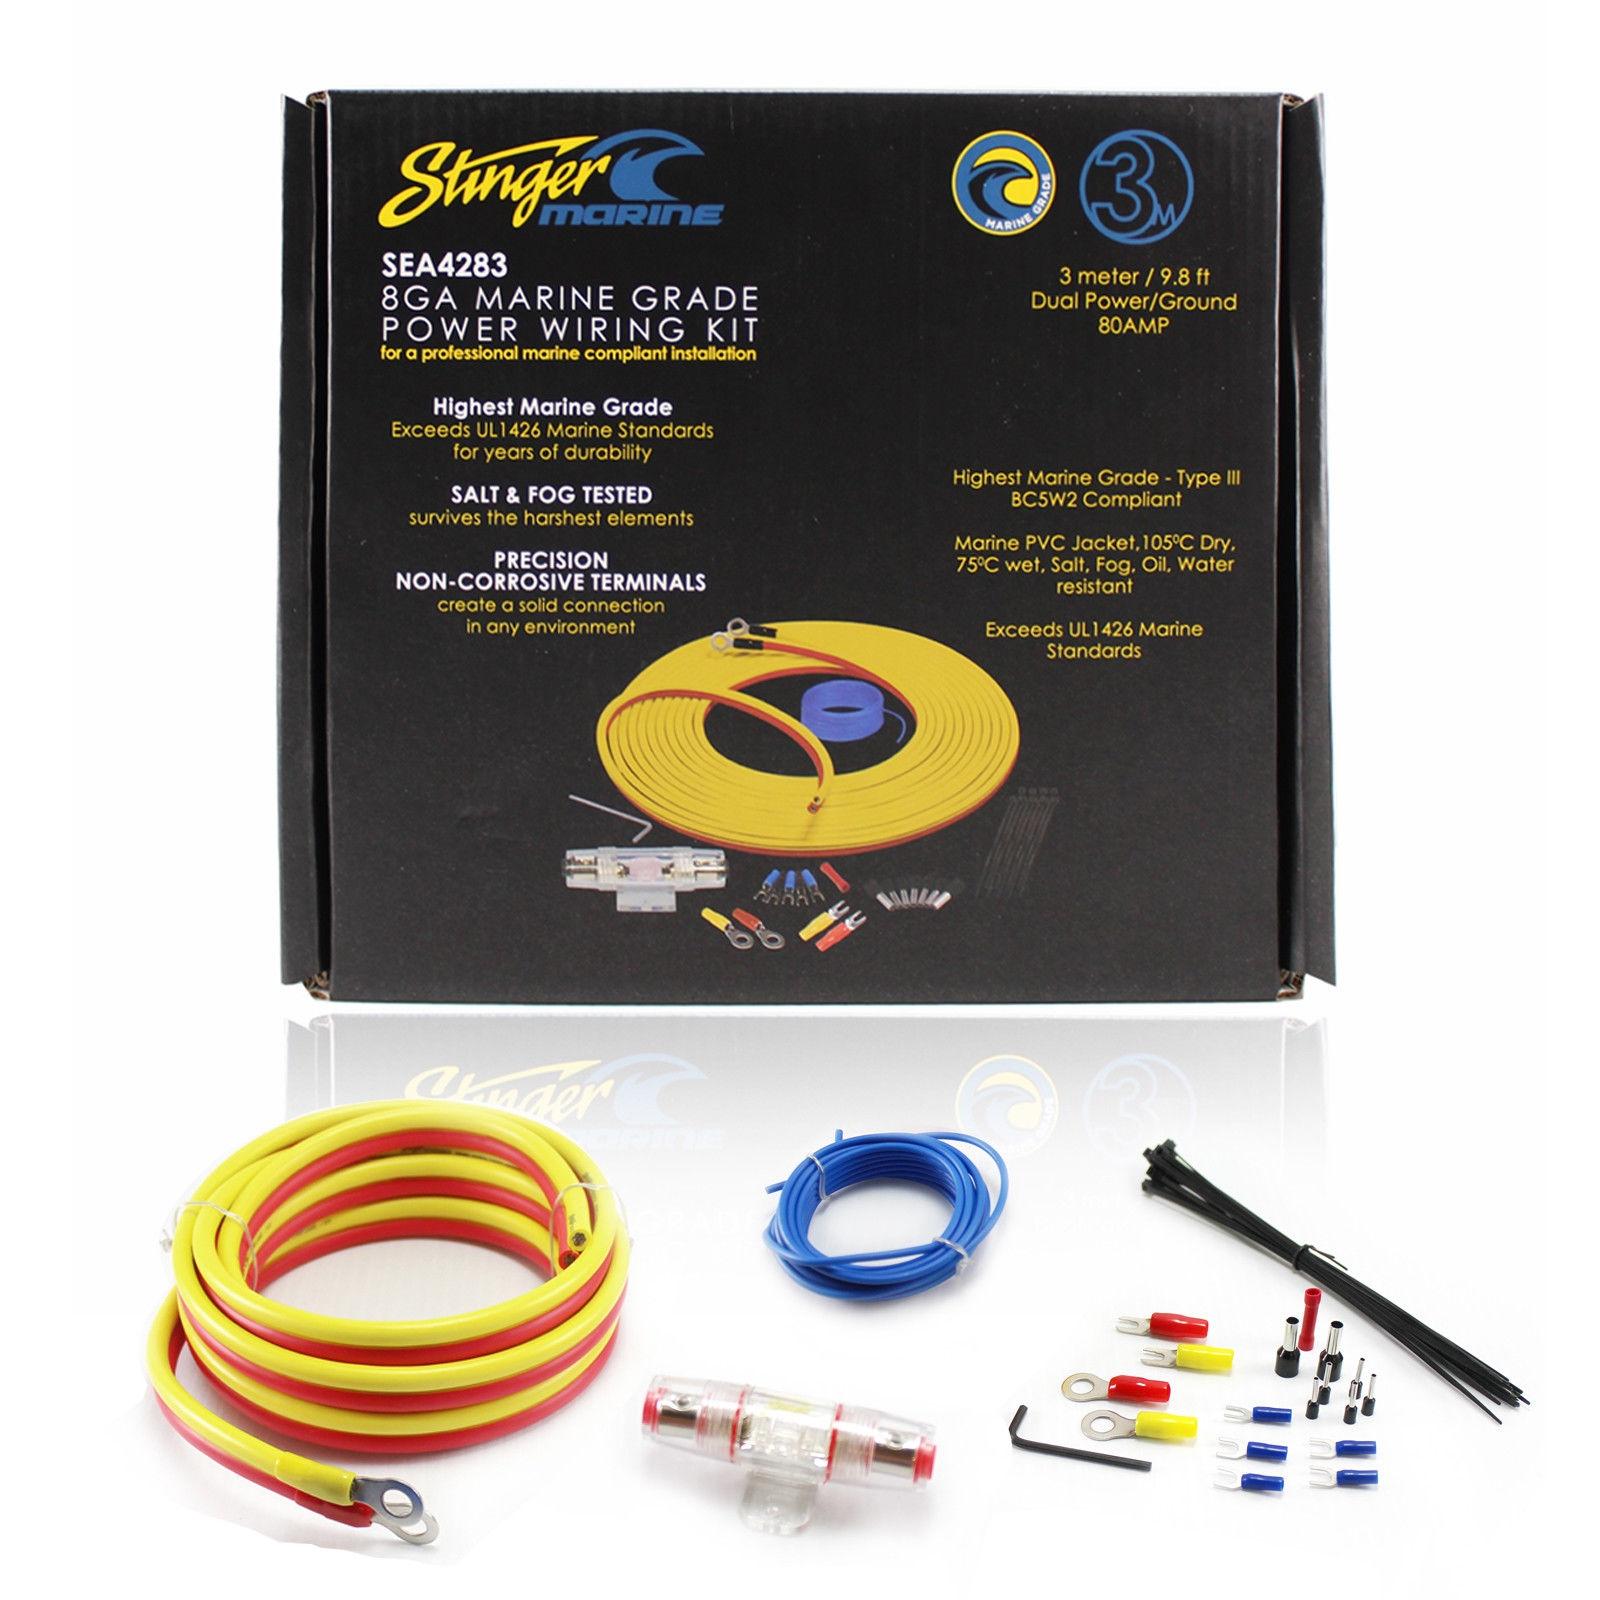 hight resolution of stinger sea4283 boat utv marine amplifier installation kit 8ga 3 details about stinger sea4283 boat utv